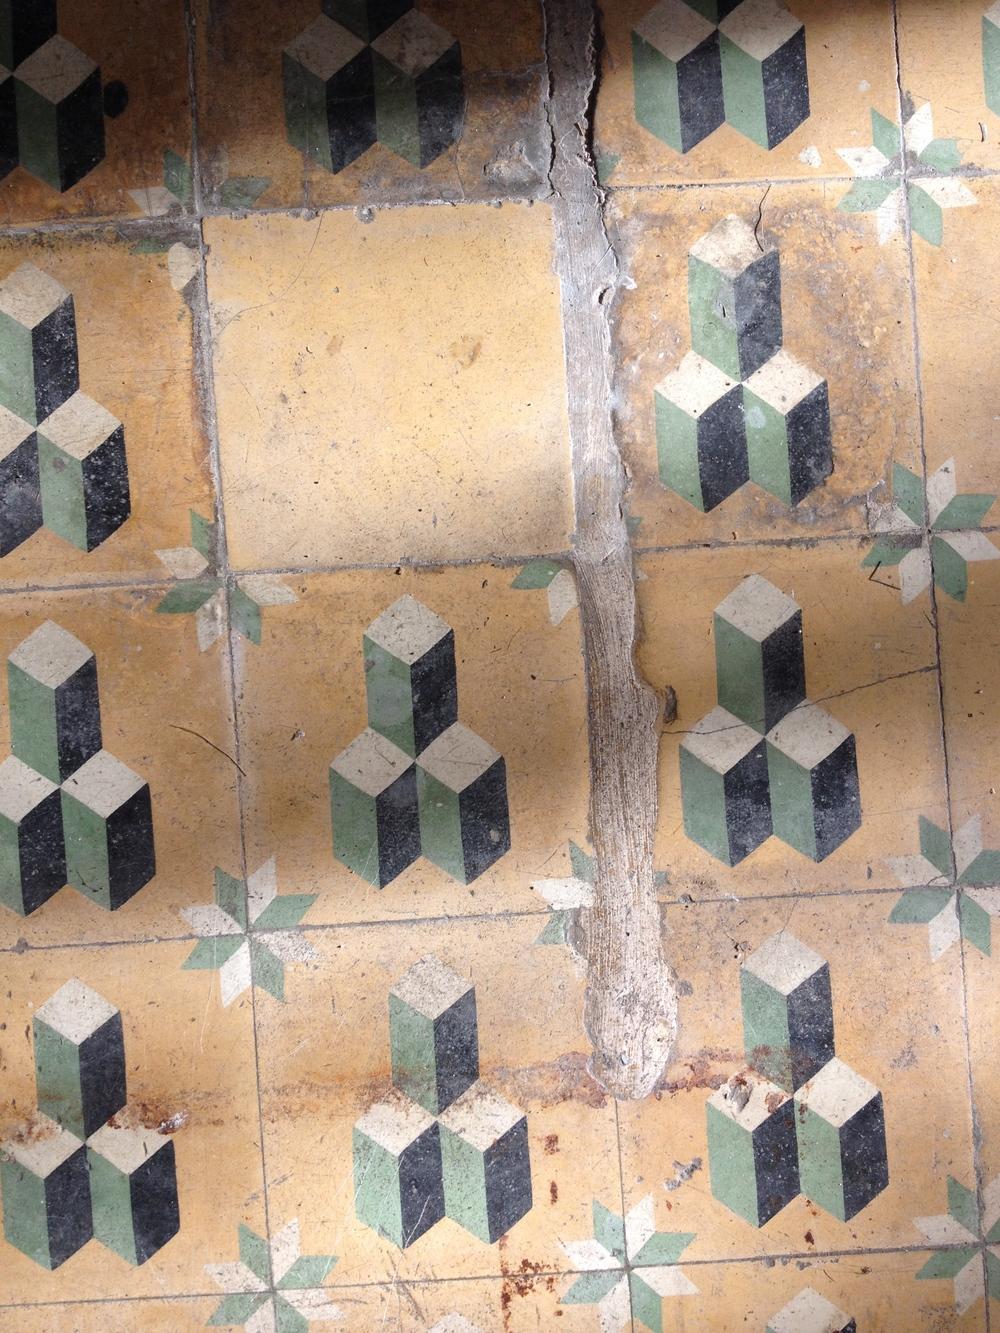 O pavimento, entre o encanto e os danos difíceis de reparar